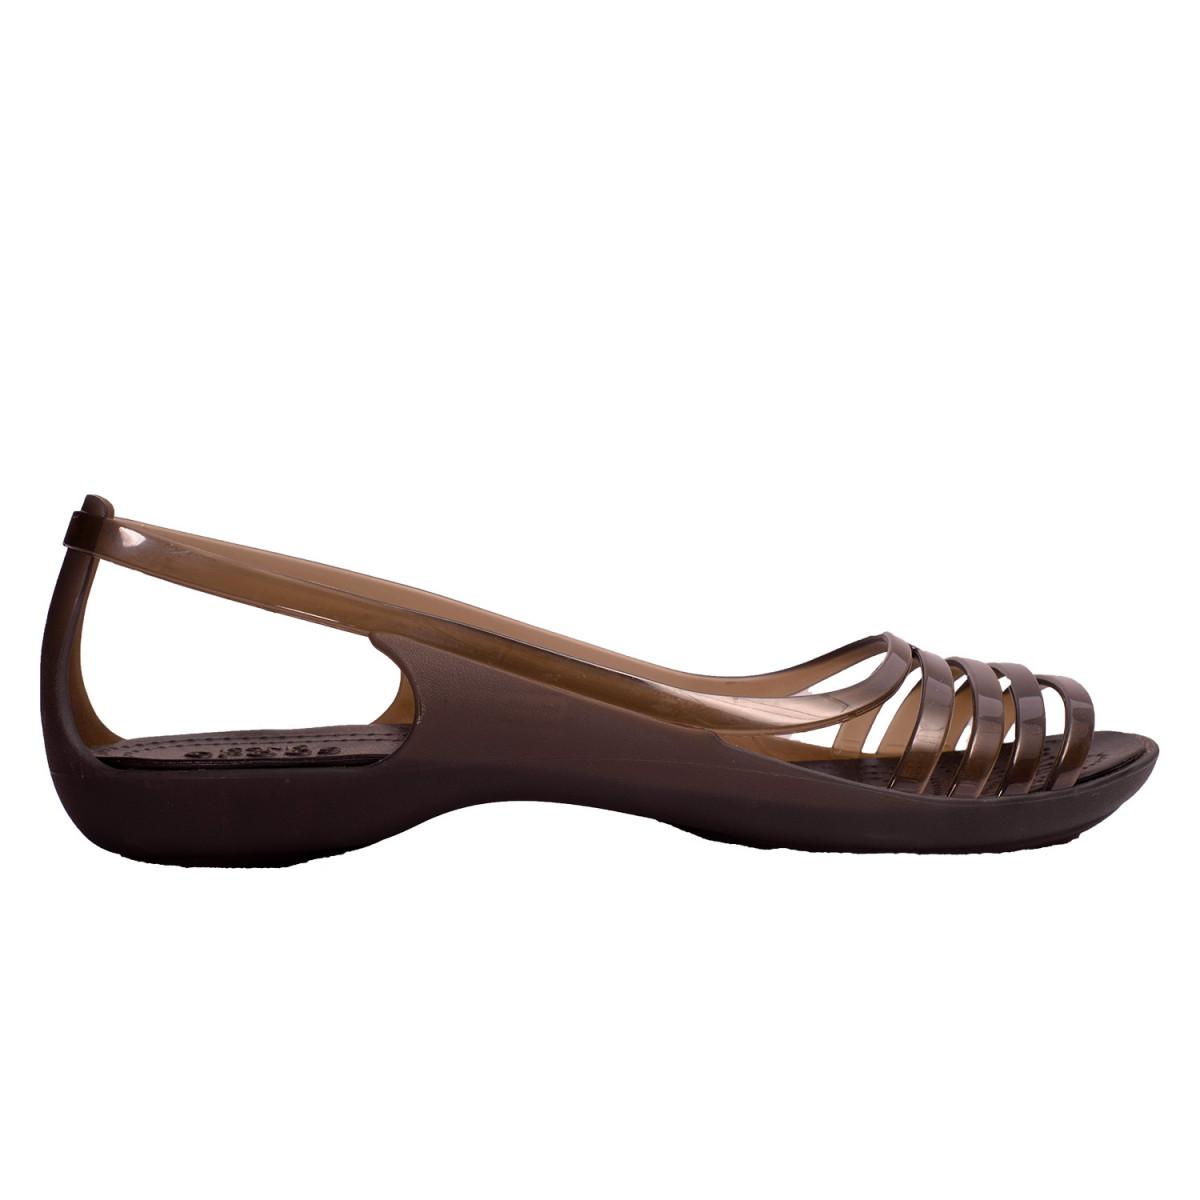 c77f6c6ce65 Sandalias Crocs Isabella Huarache Flat